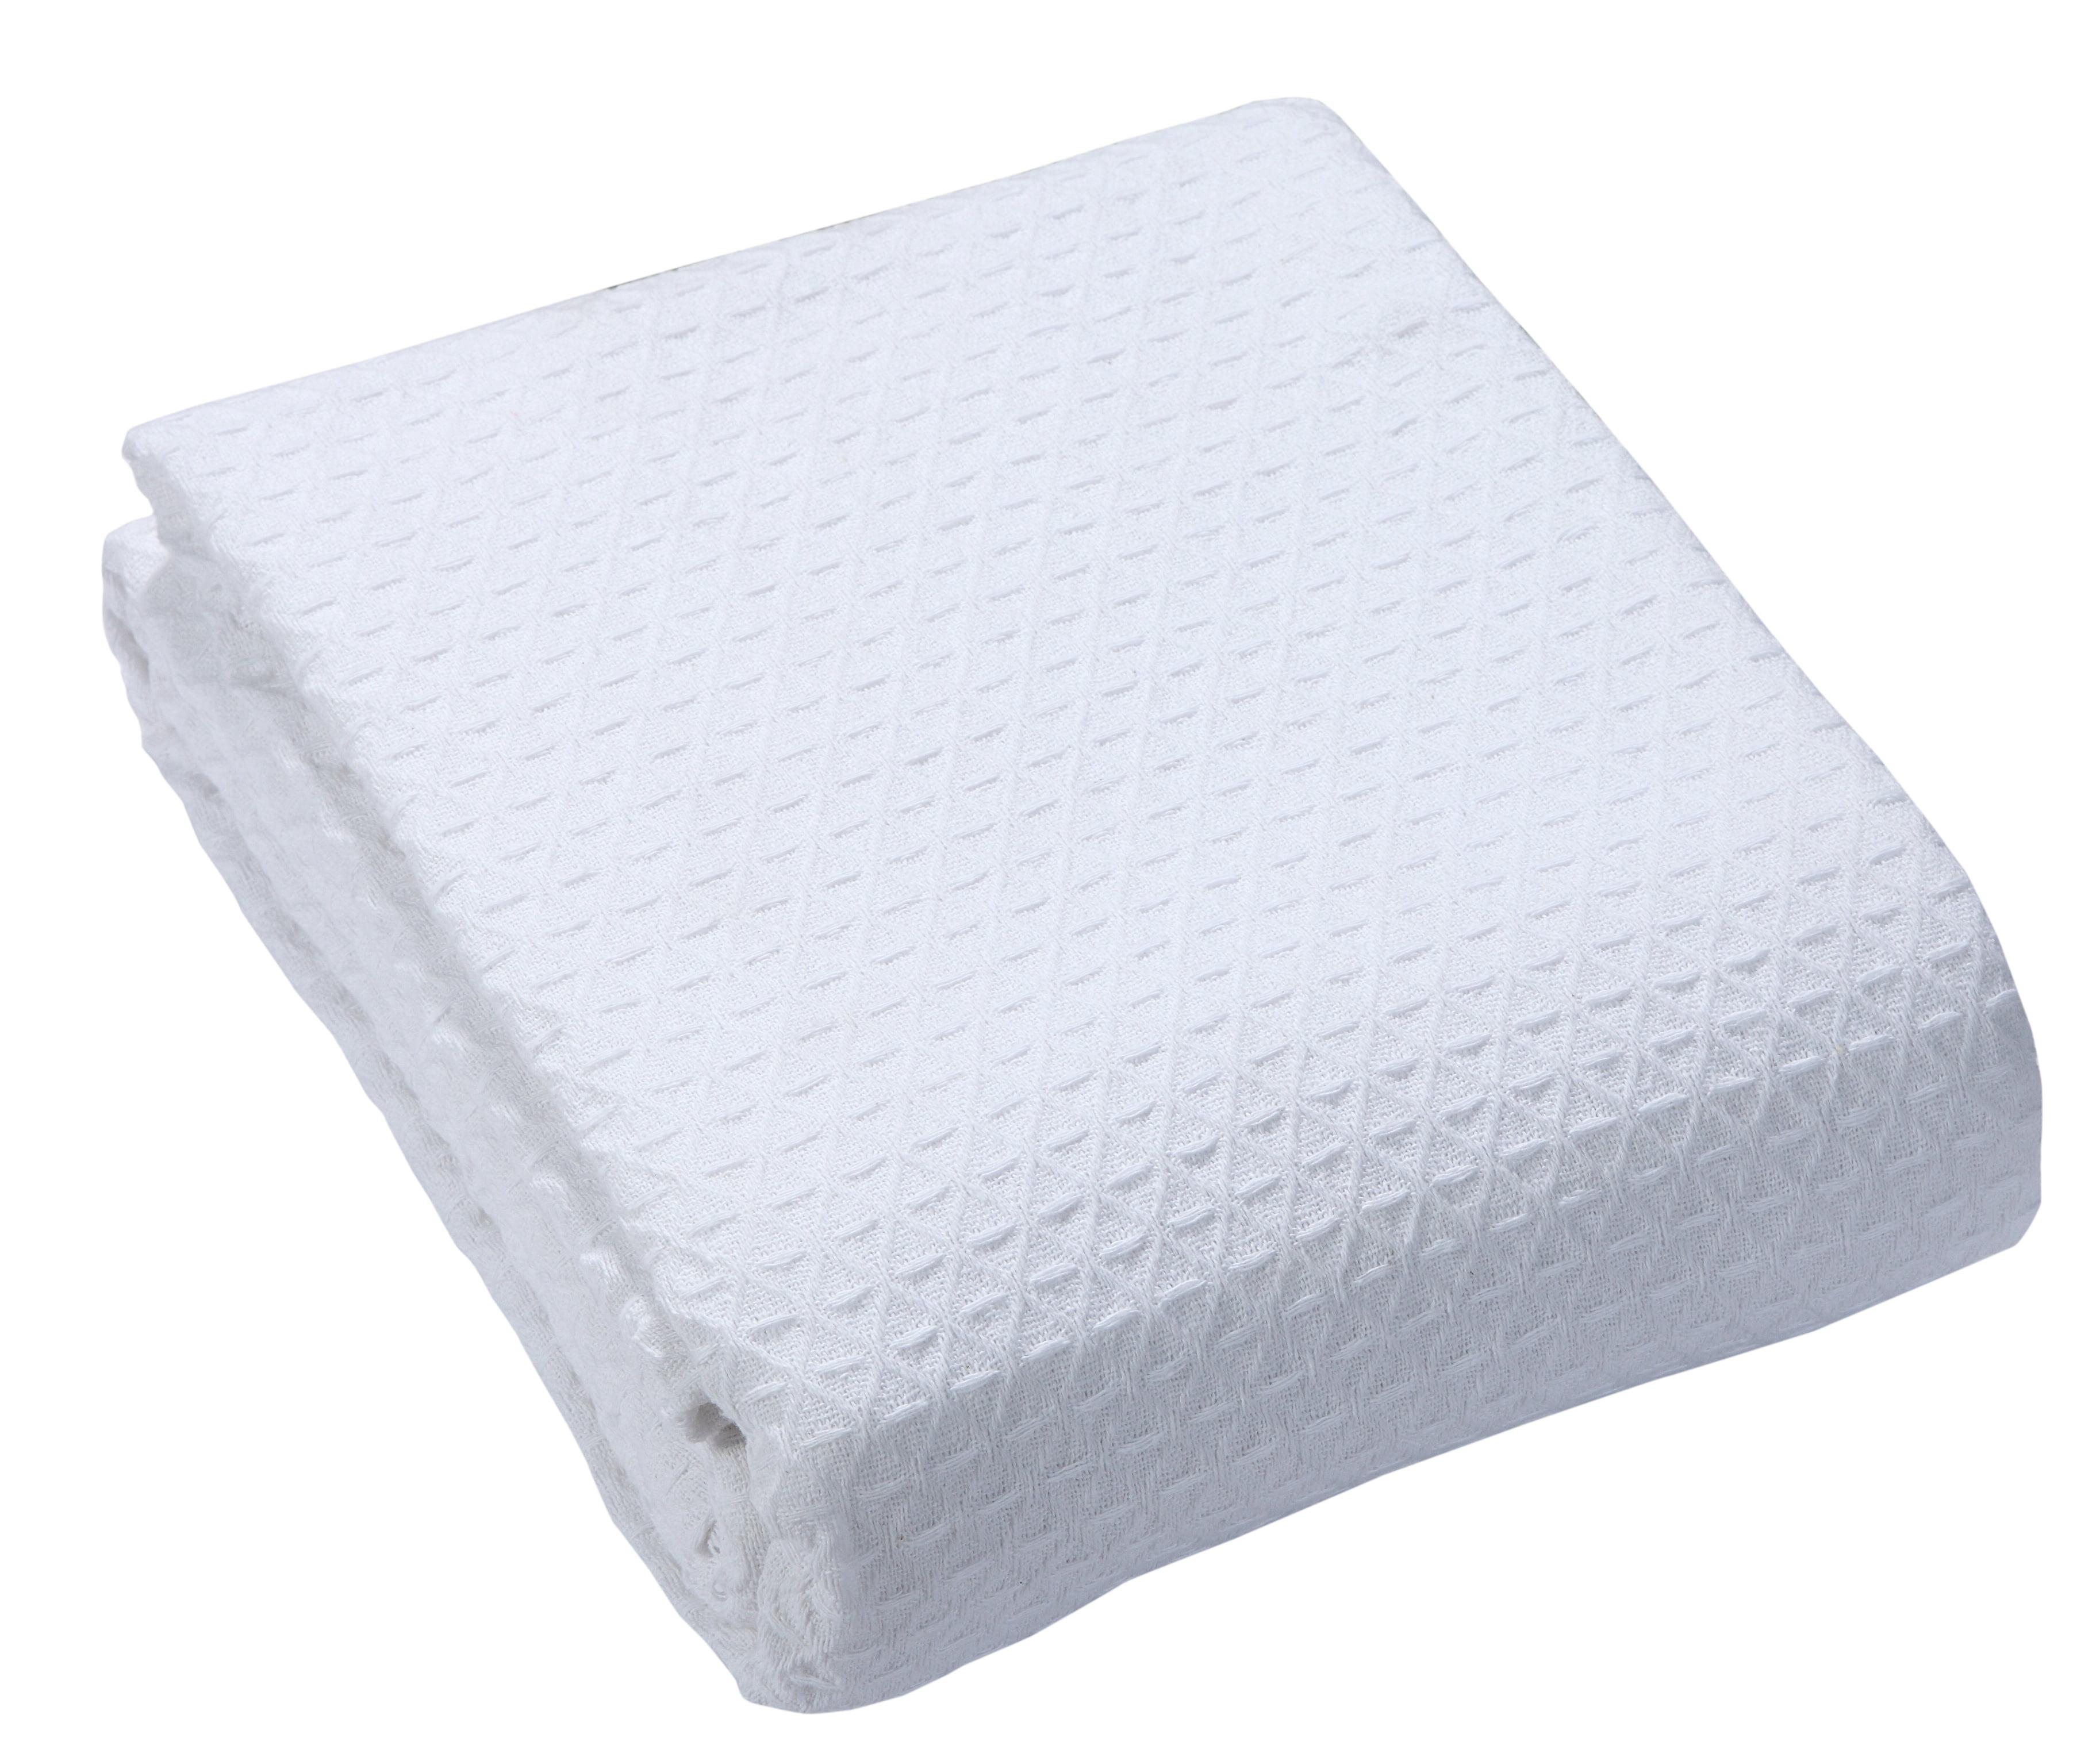 Classic All Seasons Super Soft Medium Weight Cotton Blanket by Intradeglobal LLC